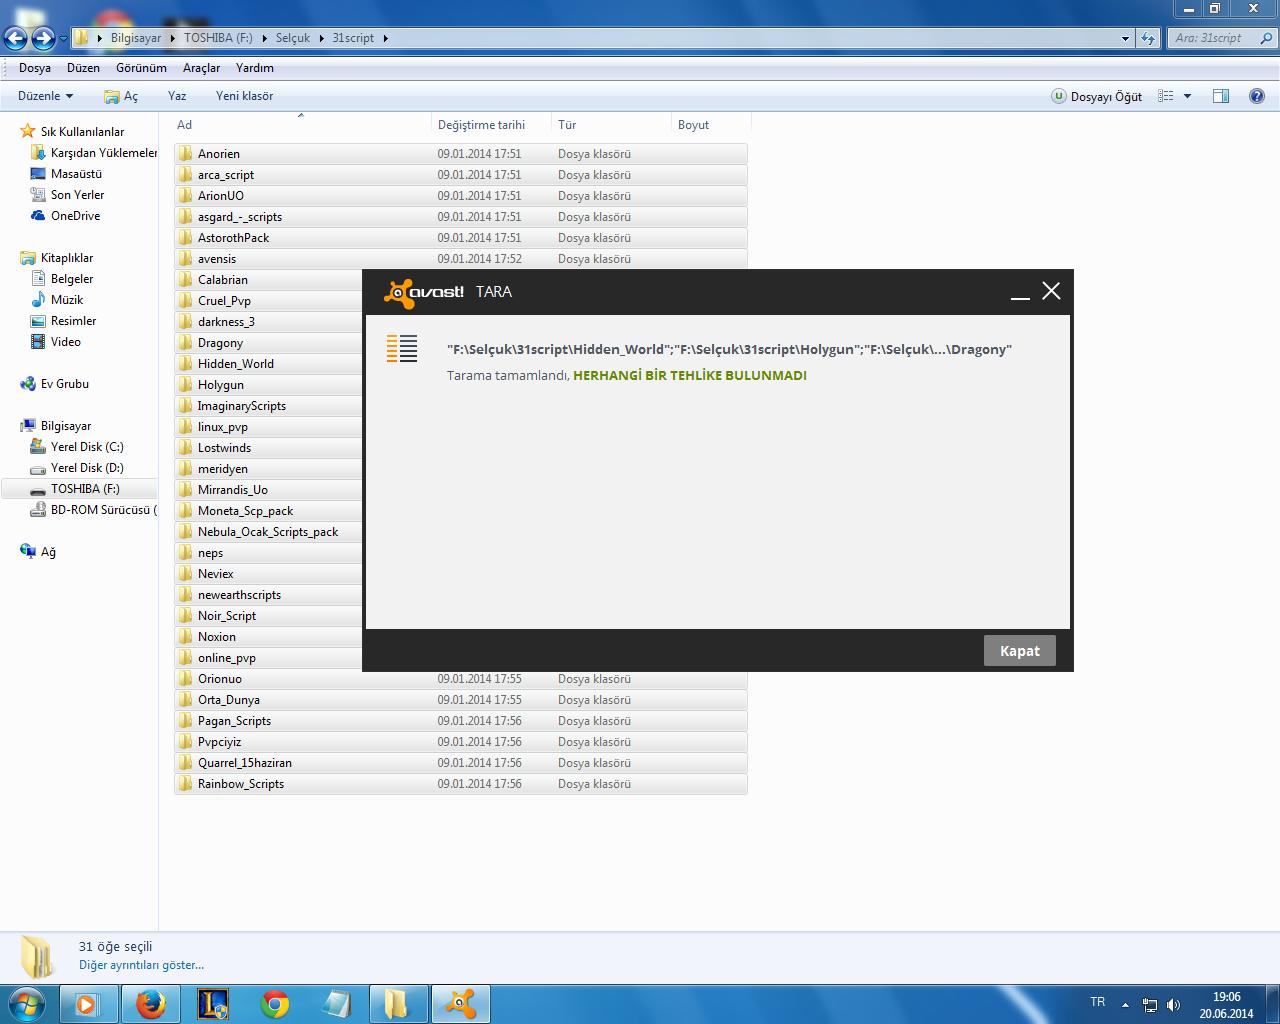 42 Server Script Pack(Artık 31 Script Pack) - Sphere